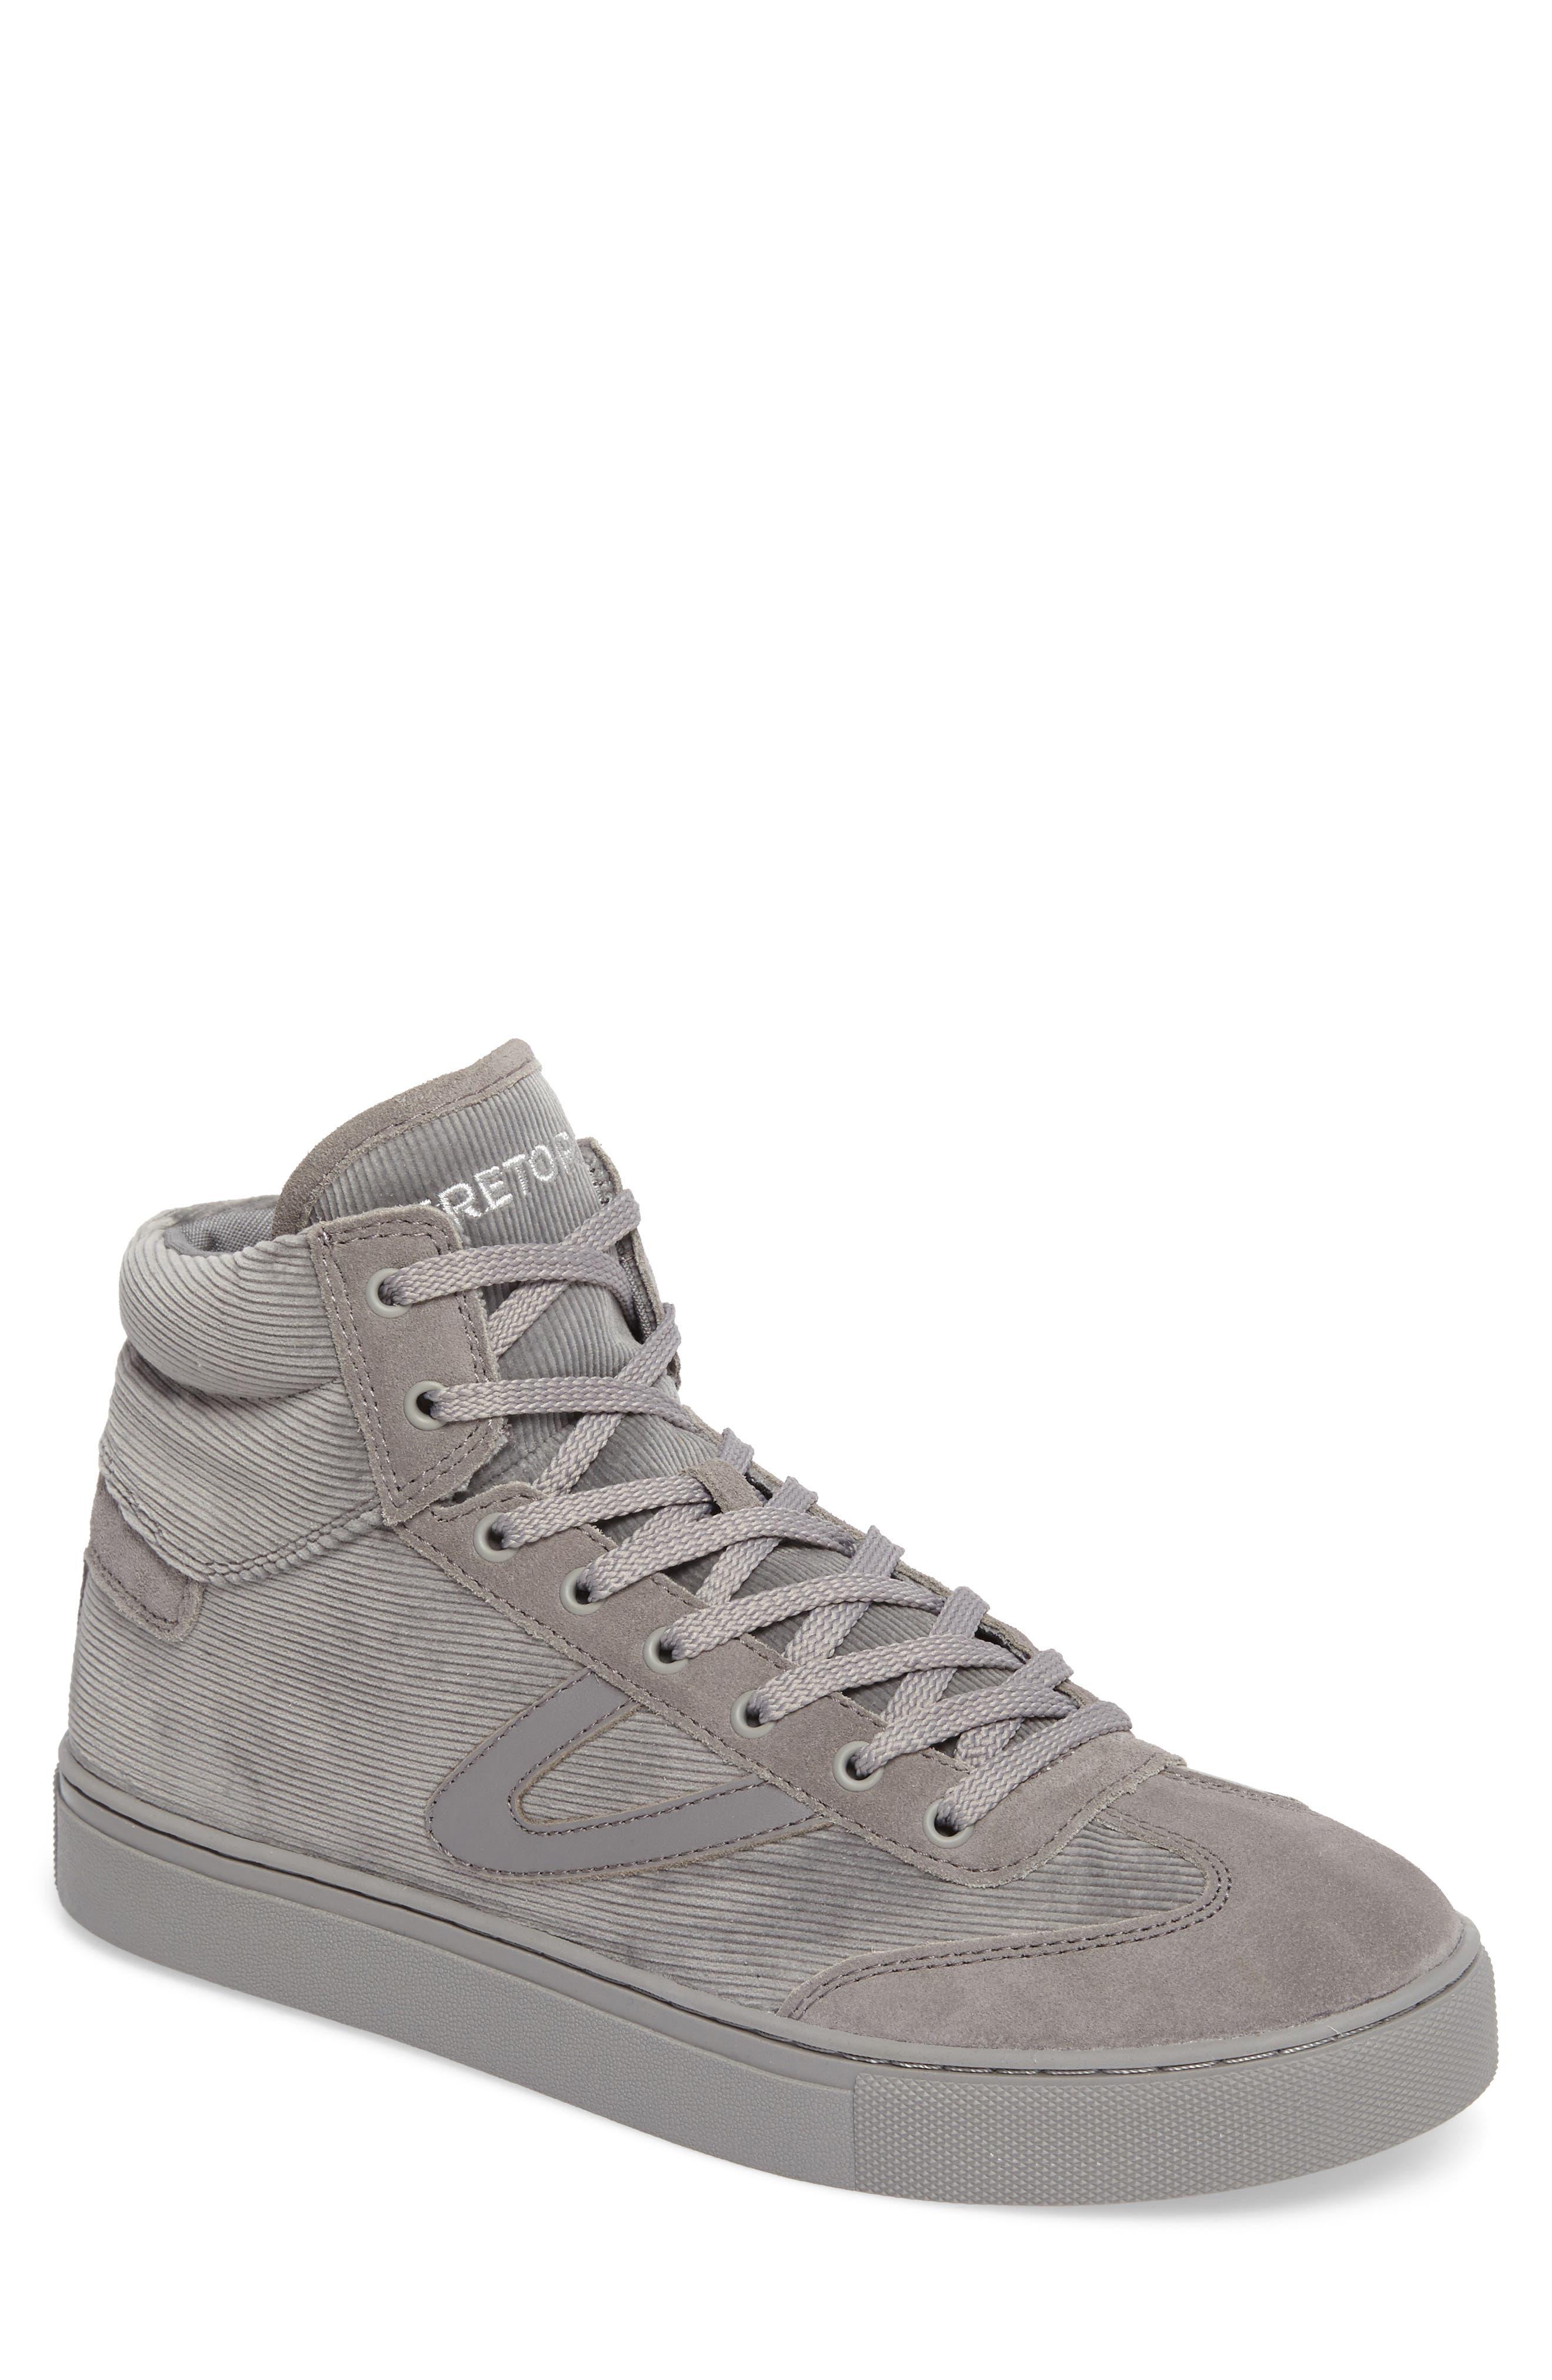 Tretorn Jack High Top Sneaker (Men)